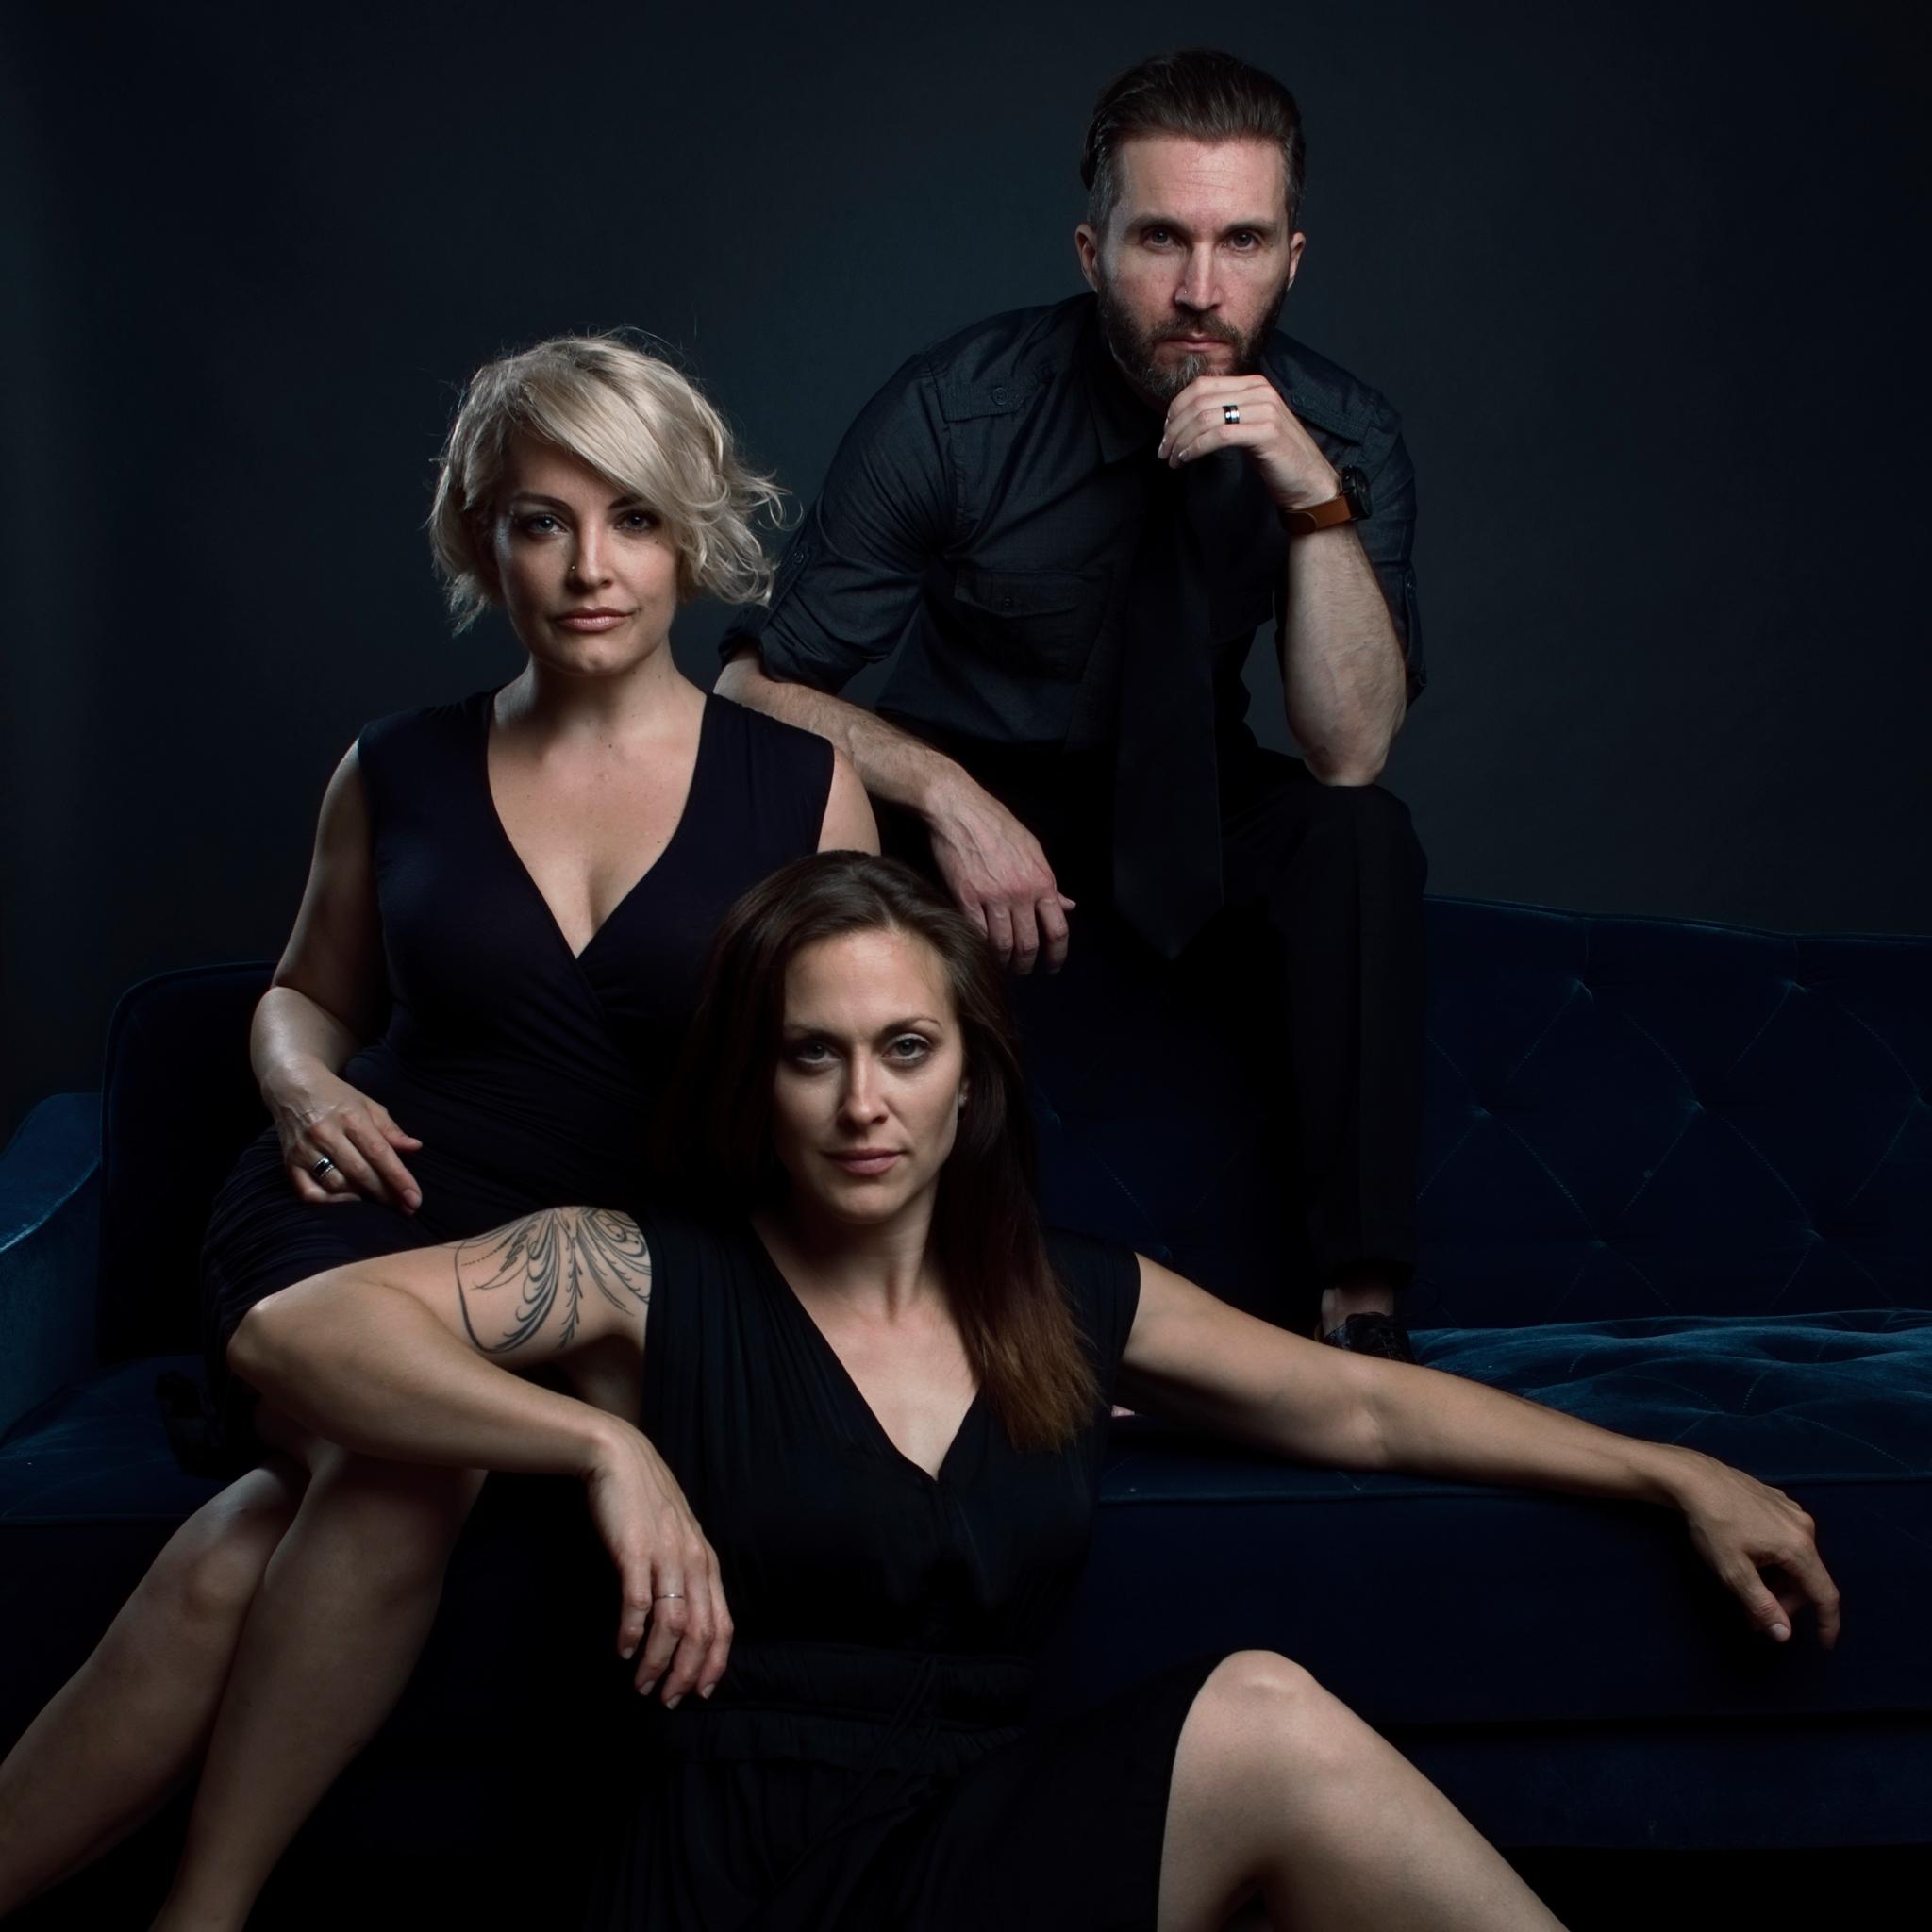 Personal Brand Photography - The Crew - Trilogie Studios